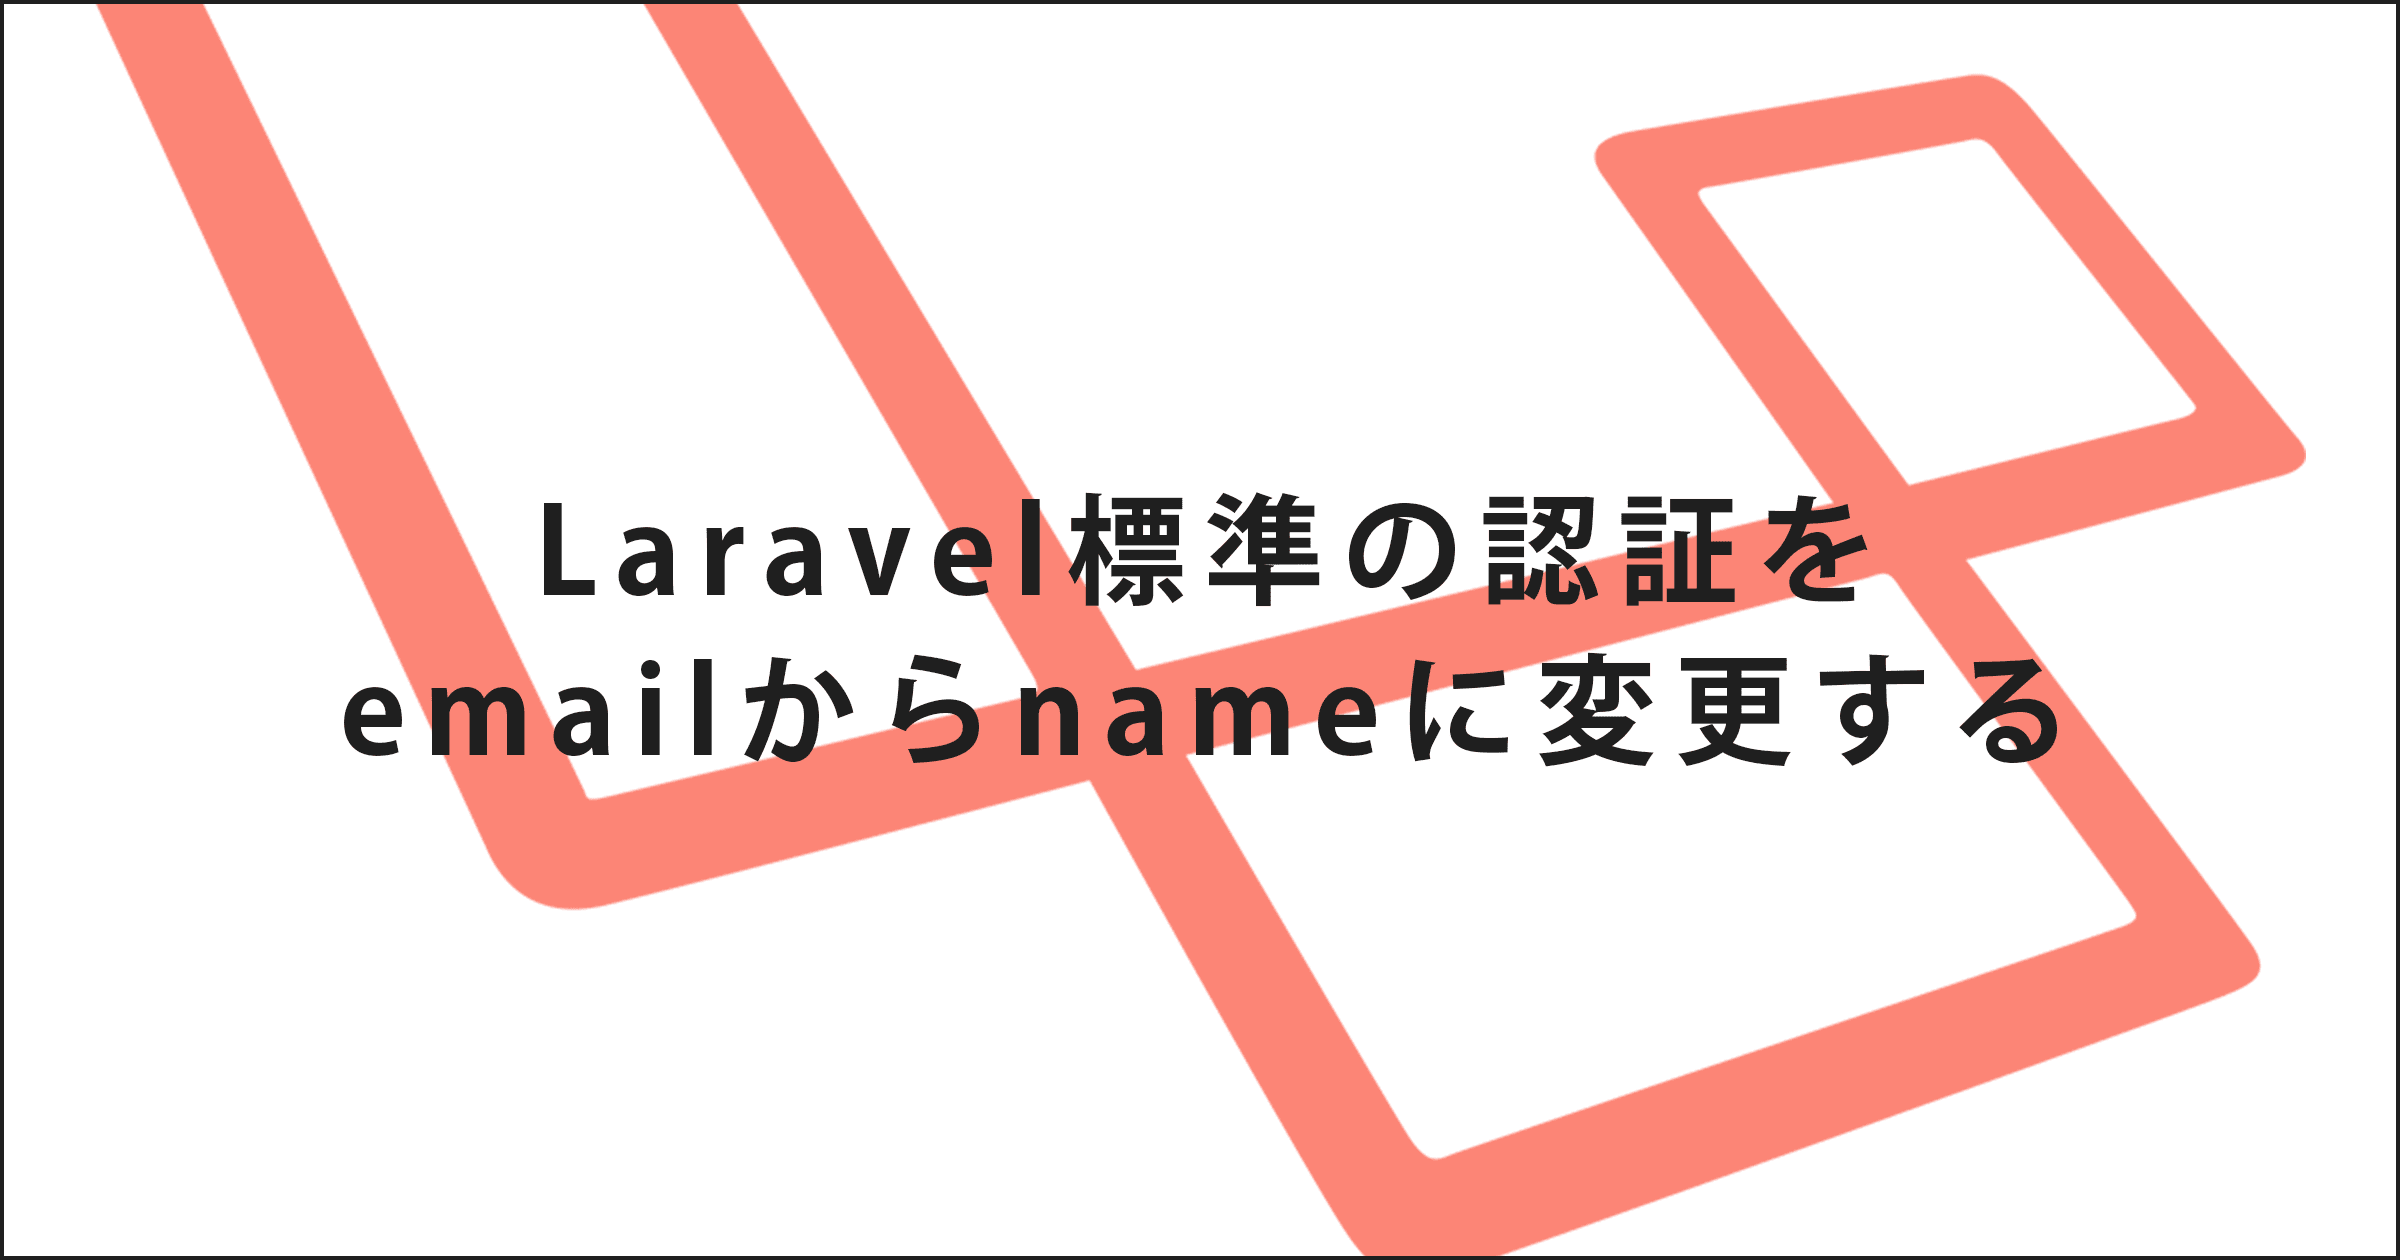 Laravel標準の認証をemailからnameに変更する